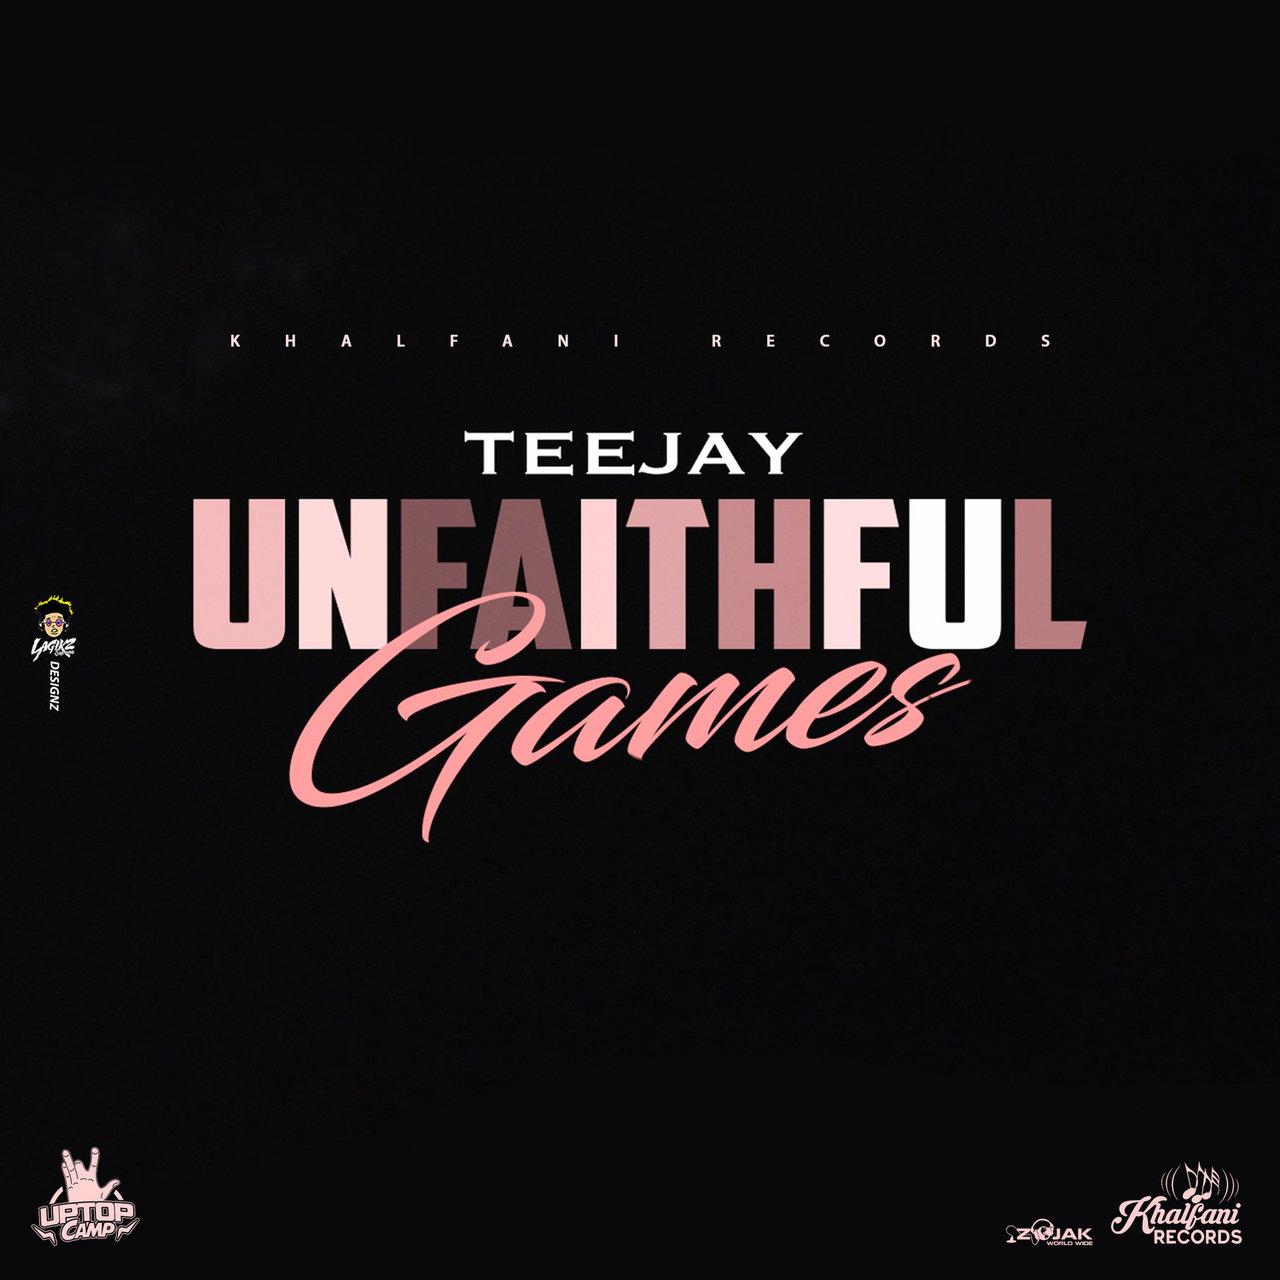 Teejay - Unfaithful Games (Cover)